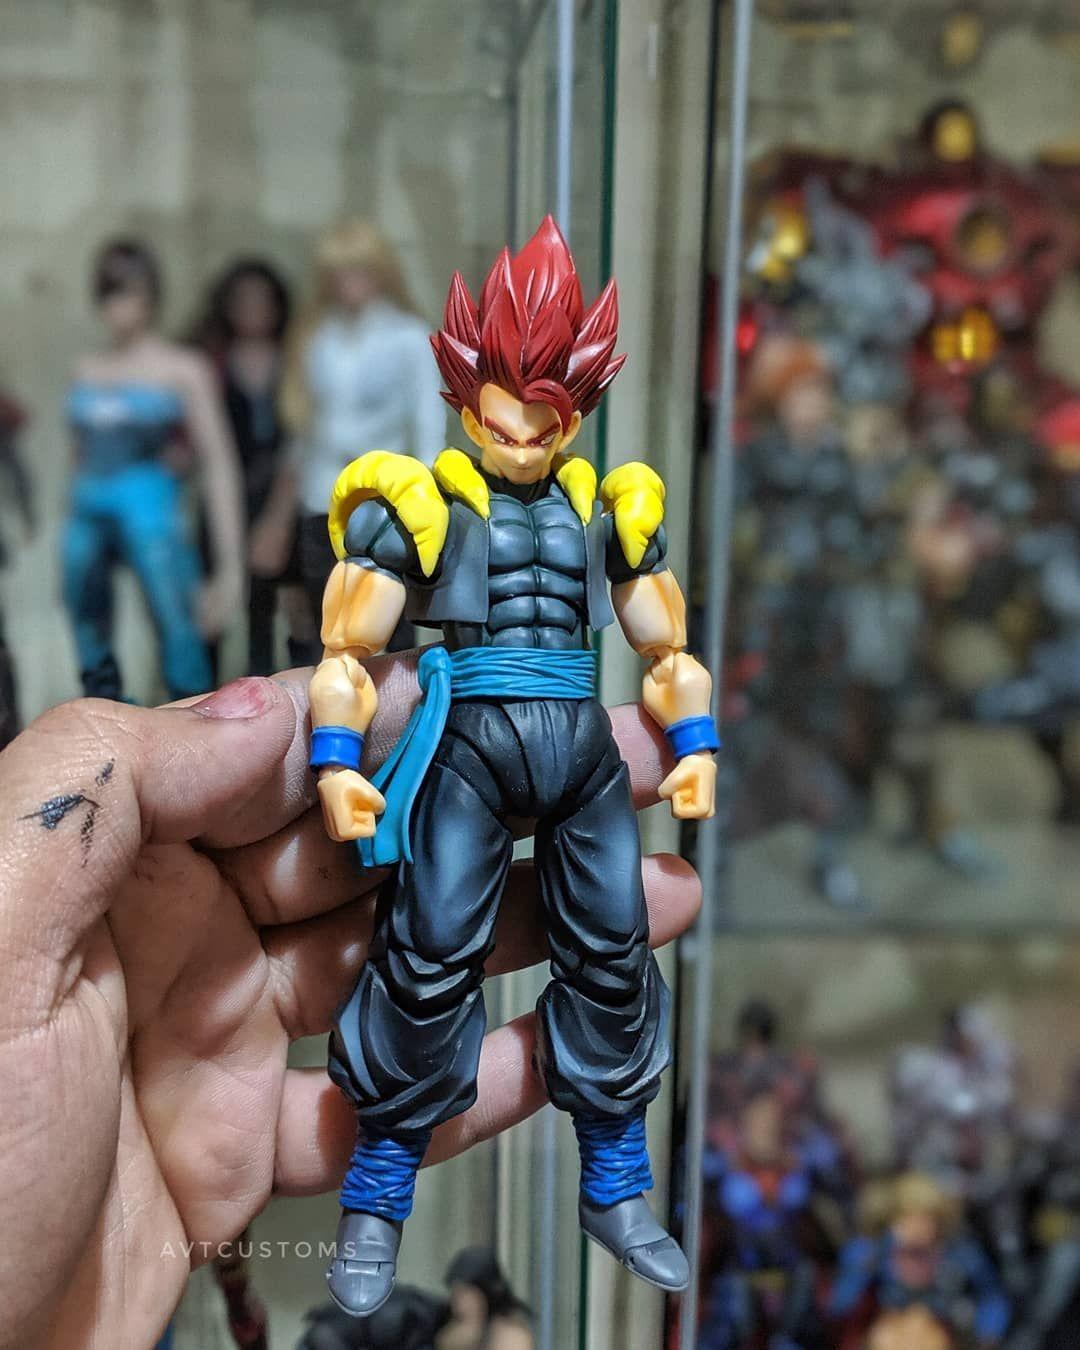 Custom Super Saiyan God Xeno Gogeta Super Saiyan God Dragon Ball Super Custom Action Figures